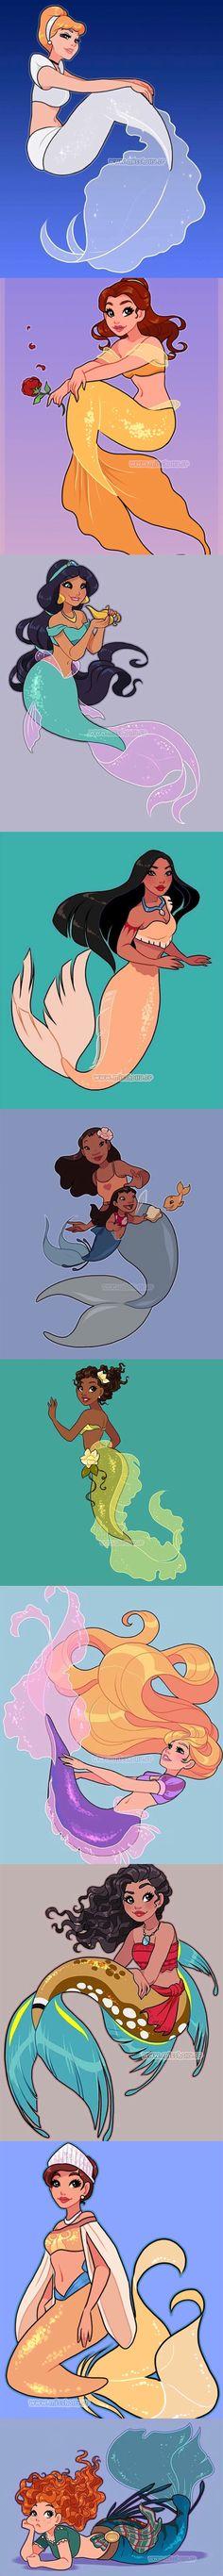 Trendy Drawing Disney Pixar The Princess Disney Pixar, Ariel Disney, Disney Marvel, Disney Animation, Disney Jokes, Funny Disney Memes, Mermaid Disney, Cute Disney, Disney Girls